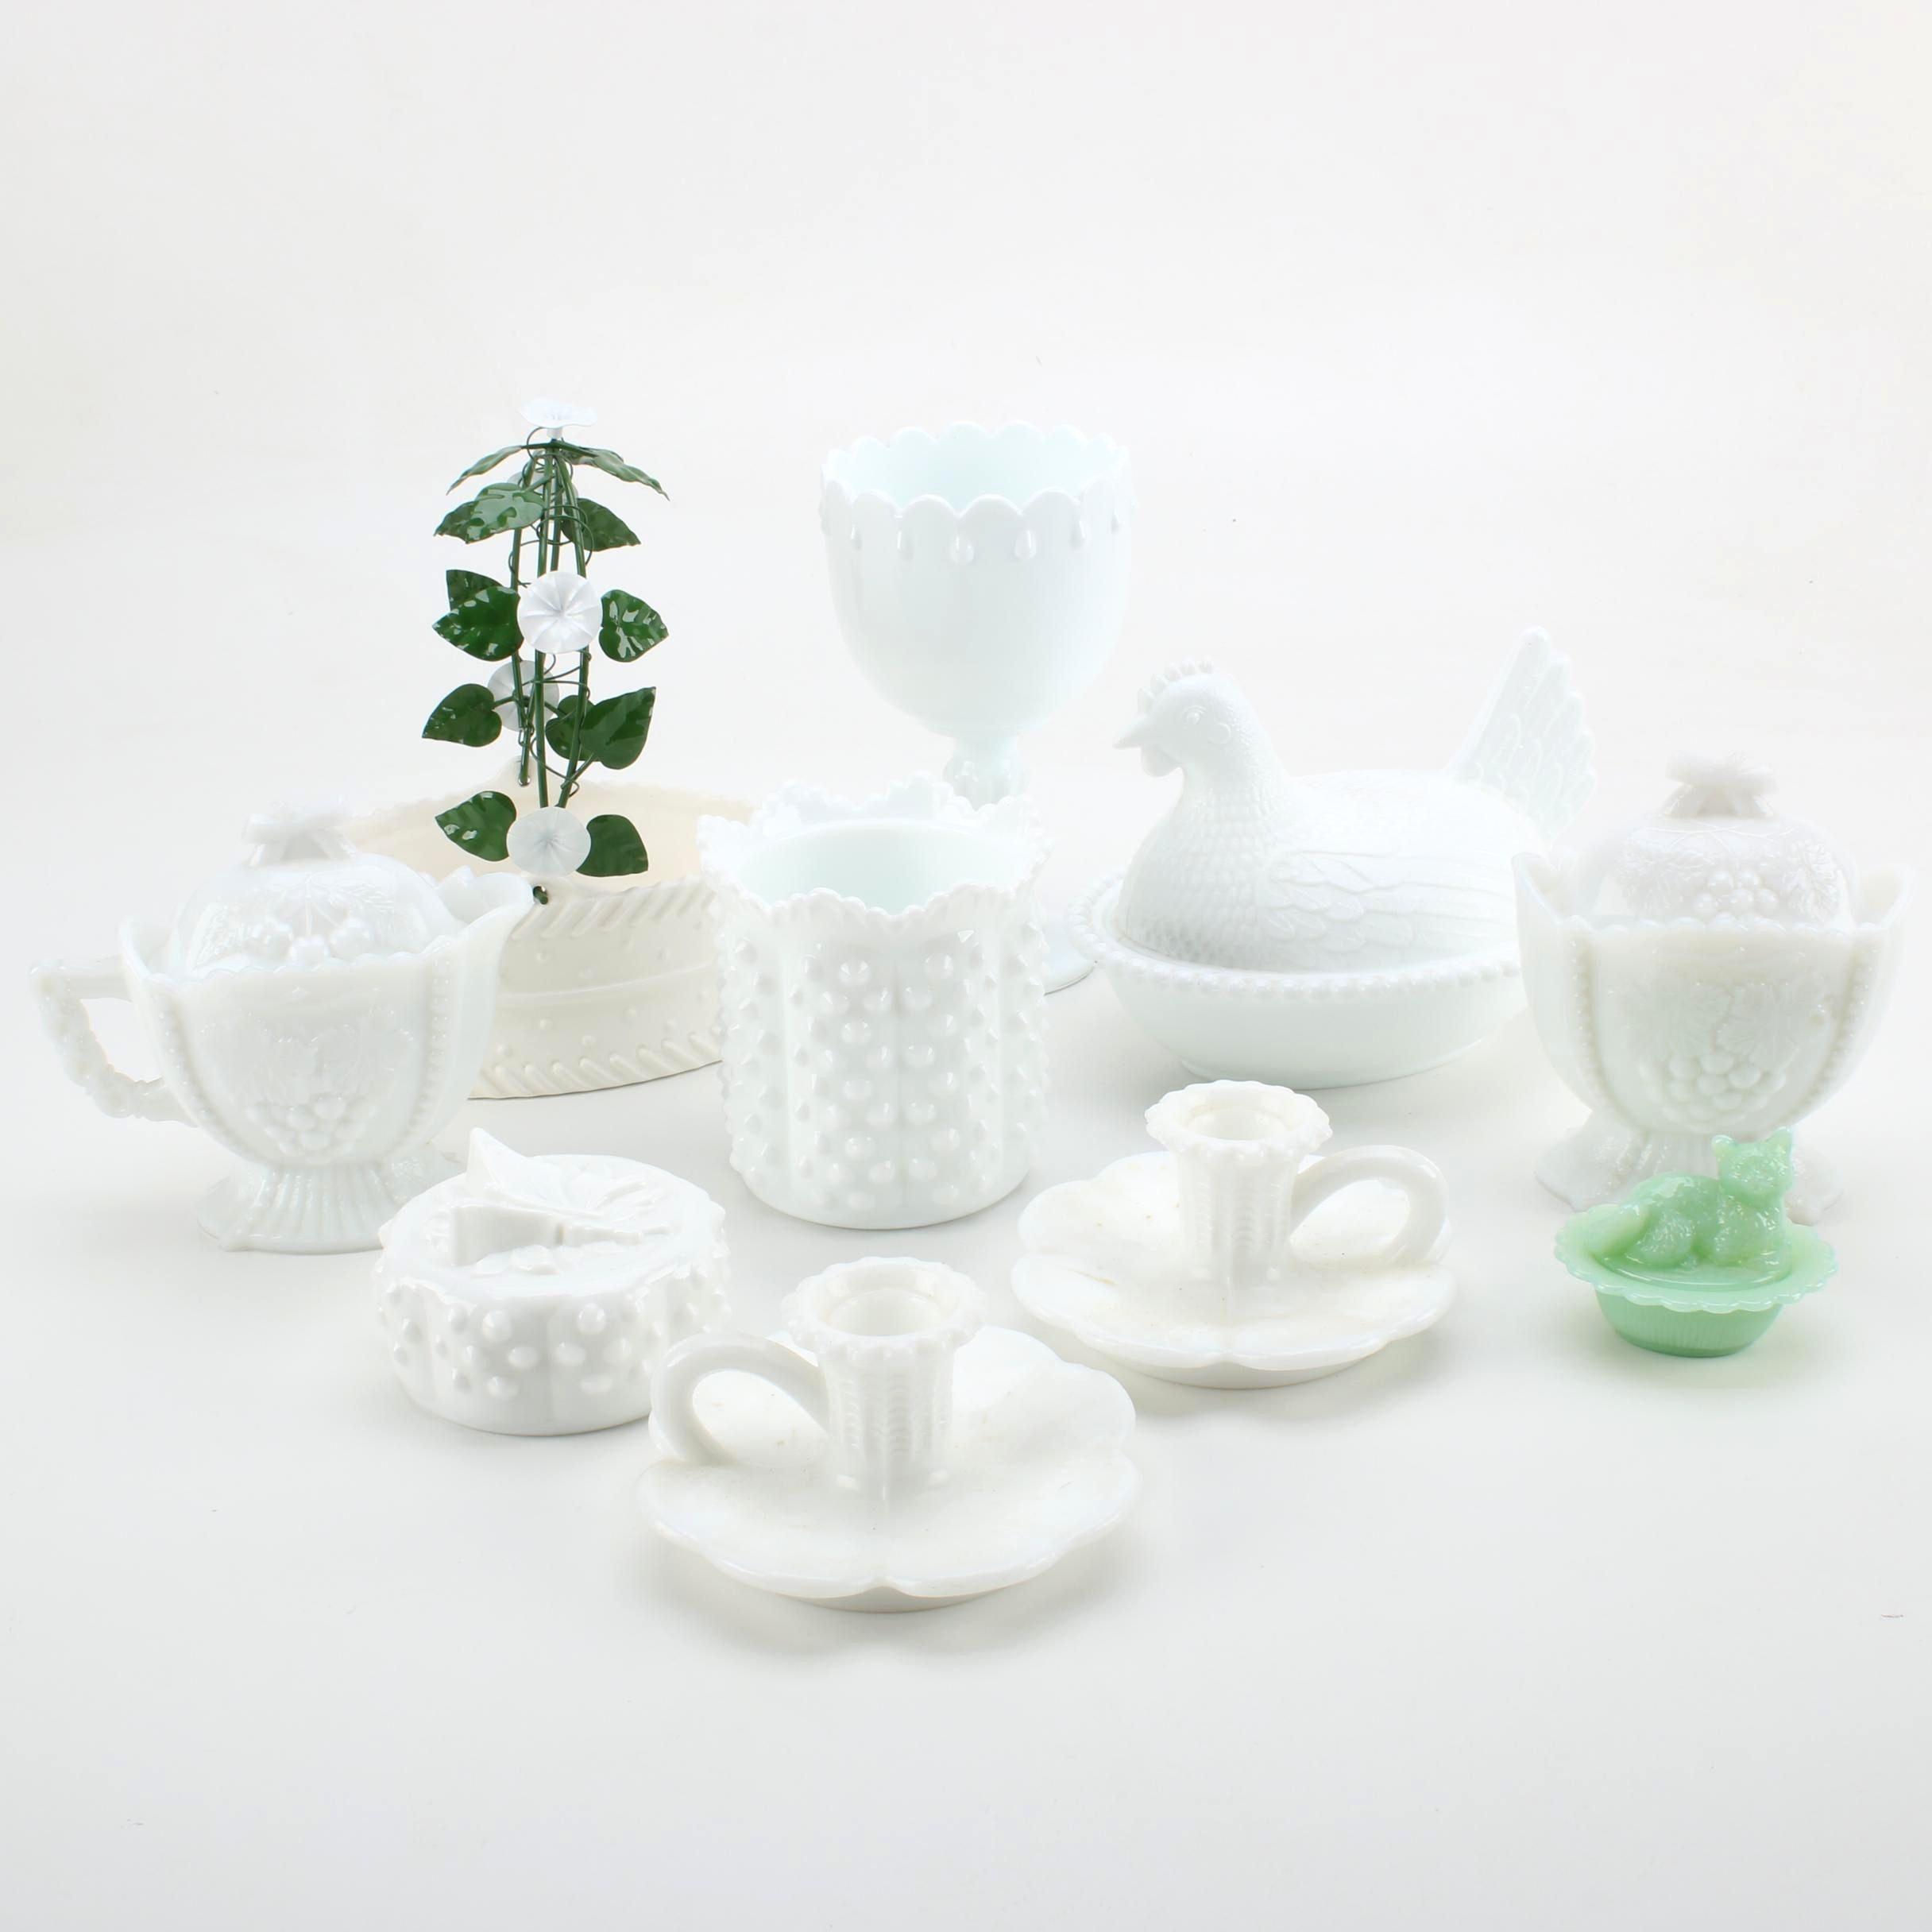 Assortment of White Milk Glass Including Fenton